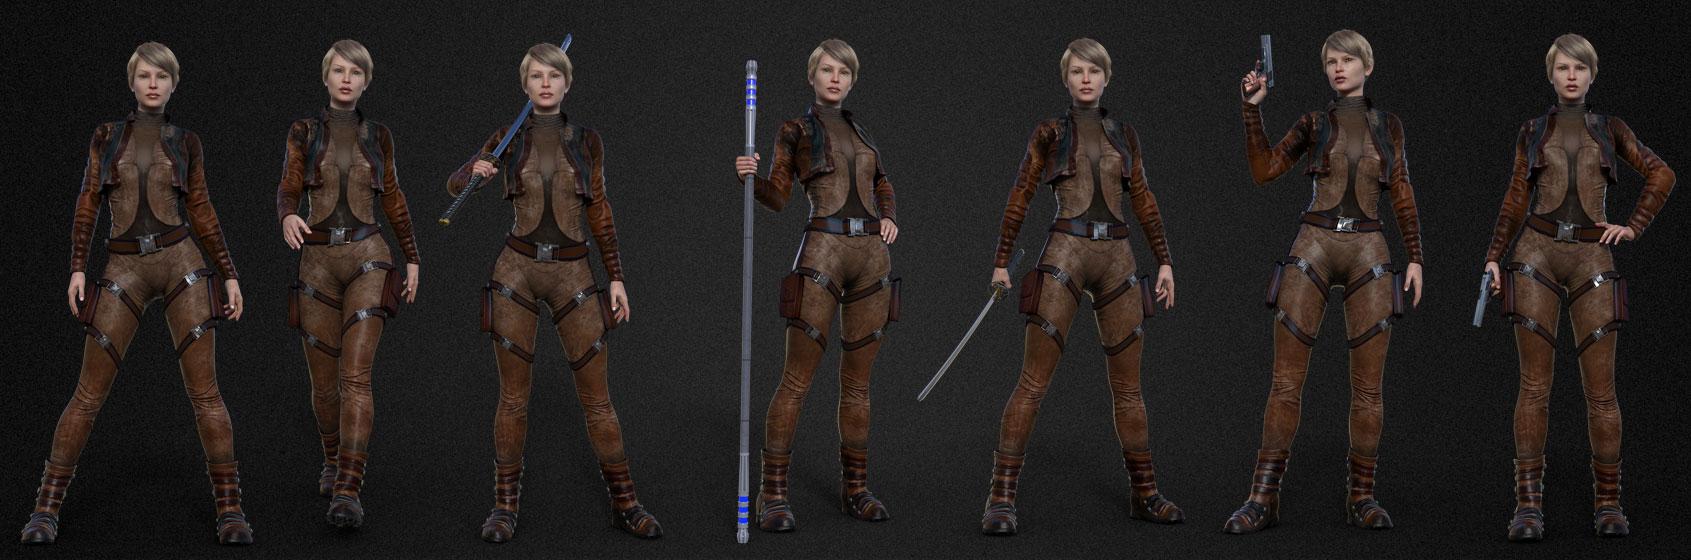 f CG galactic adventure short character lineup